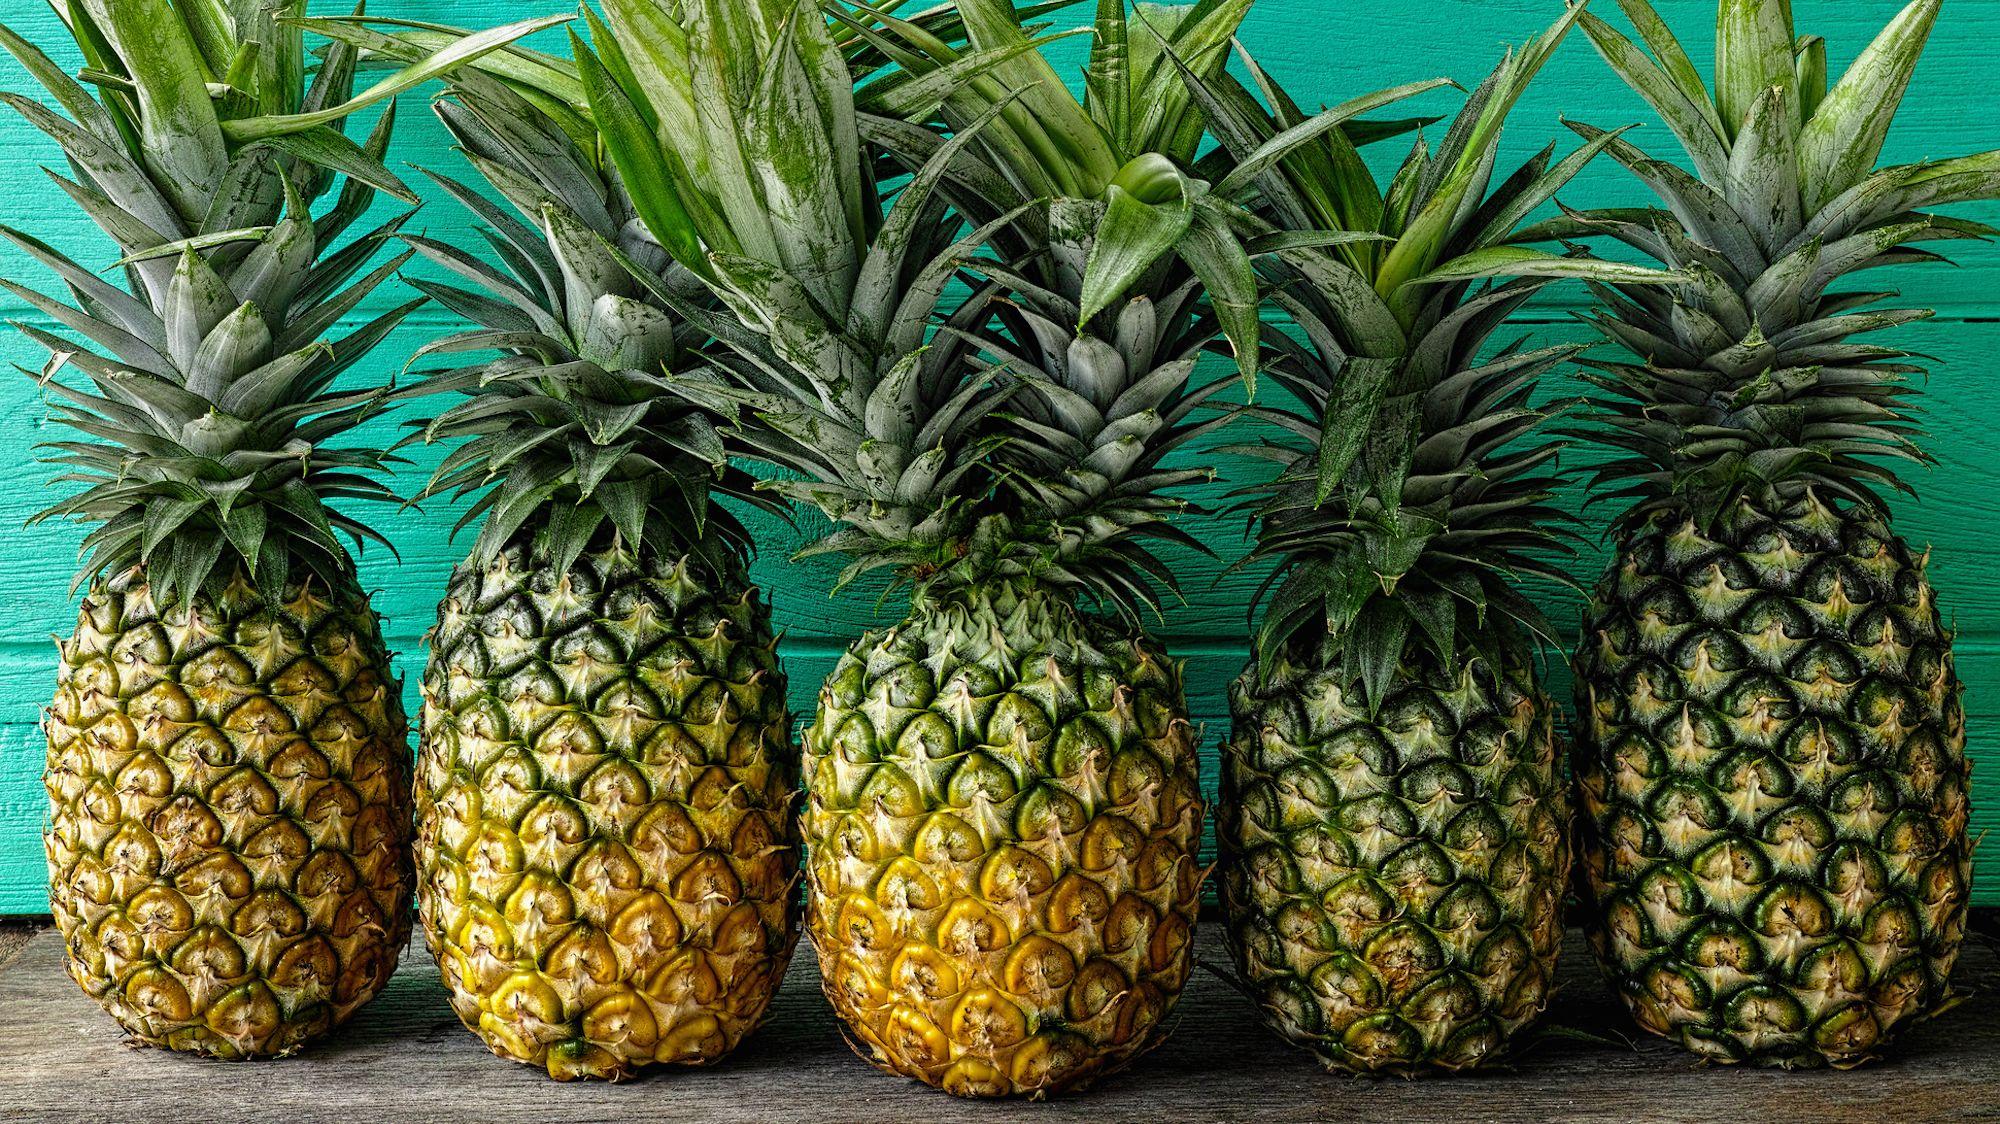 Choosing a Ripe Pineapple